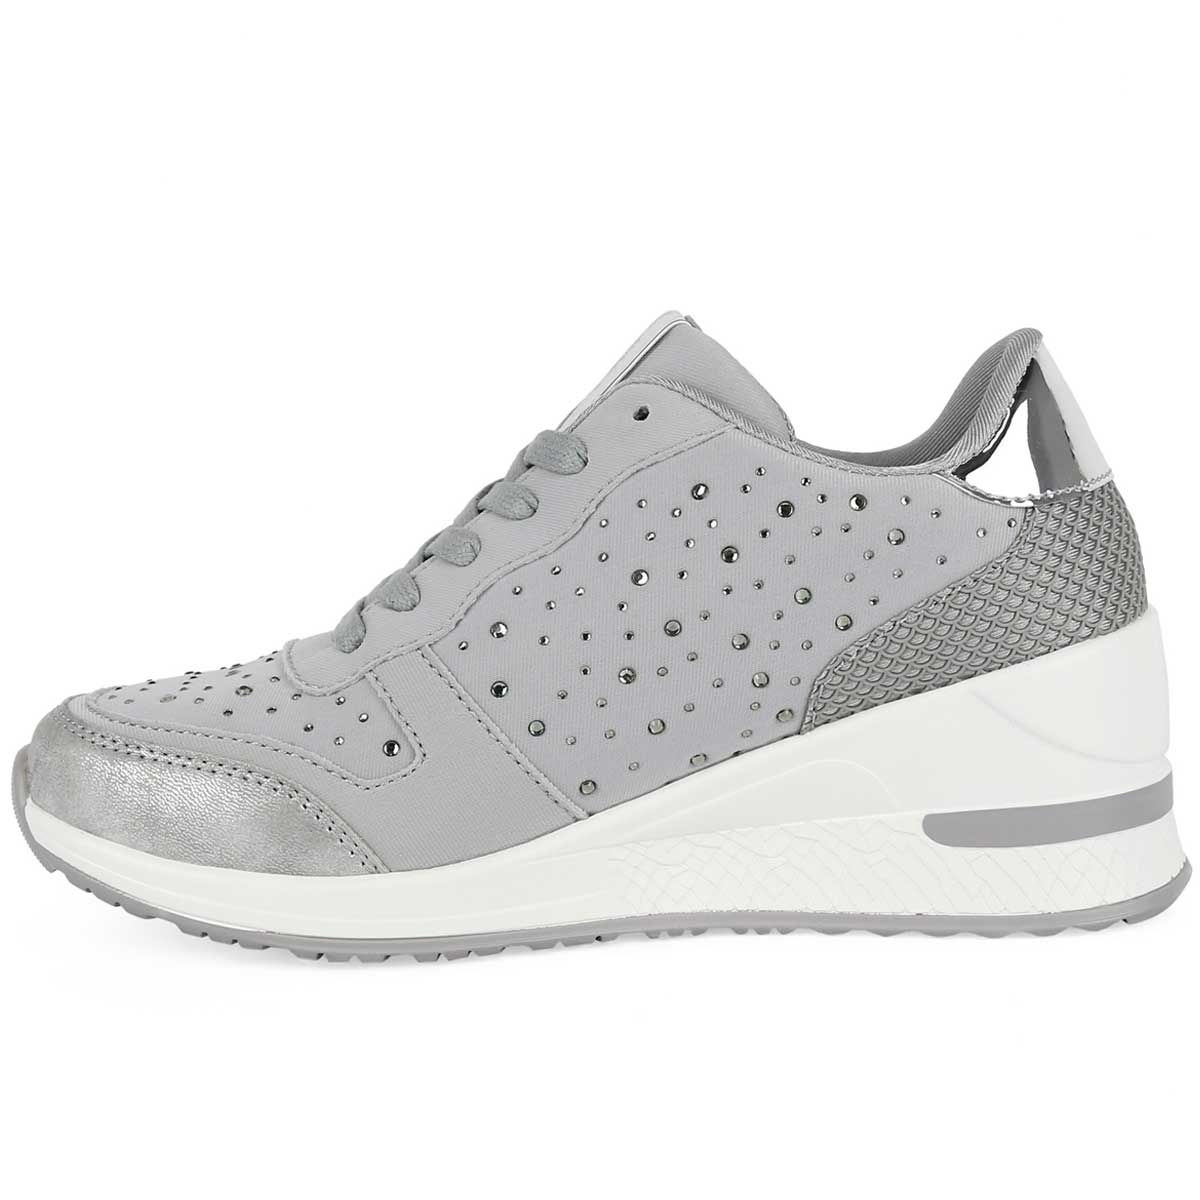 Montevita Sporty Wedge Sneaker in Silver